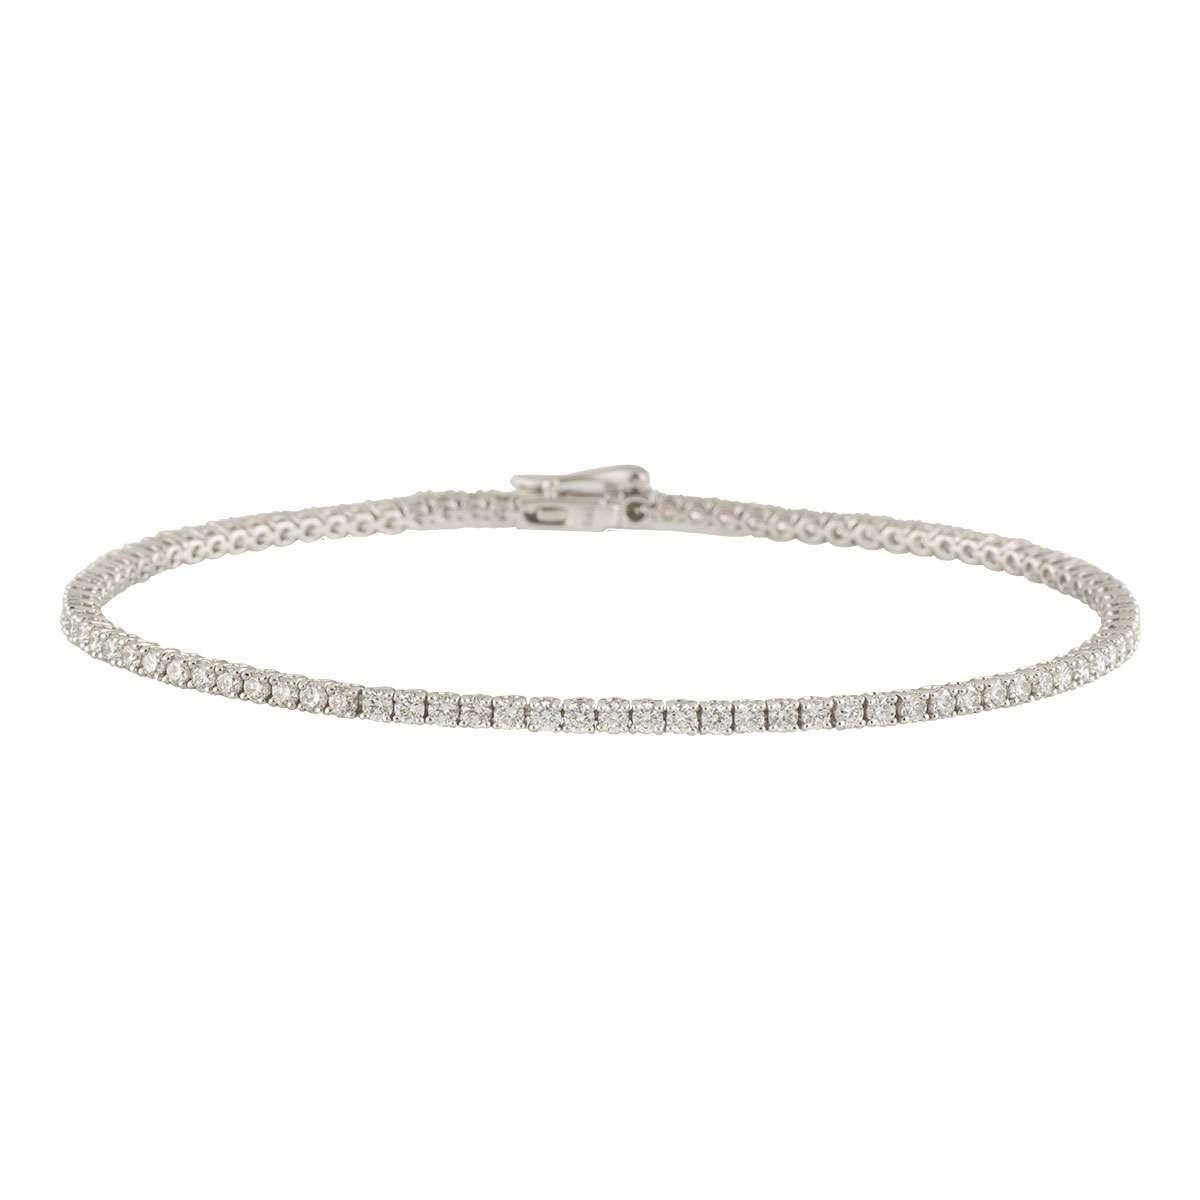 White Gold Diamond Line Bracelet 2.09ct